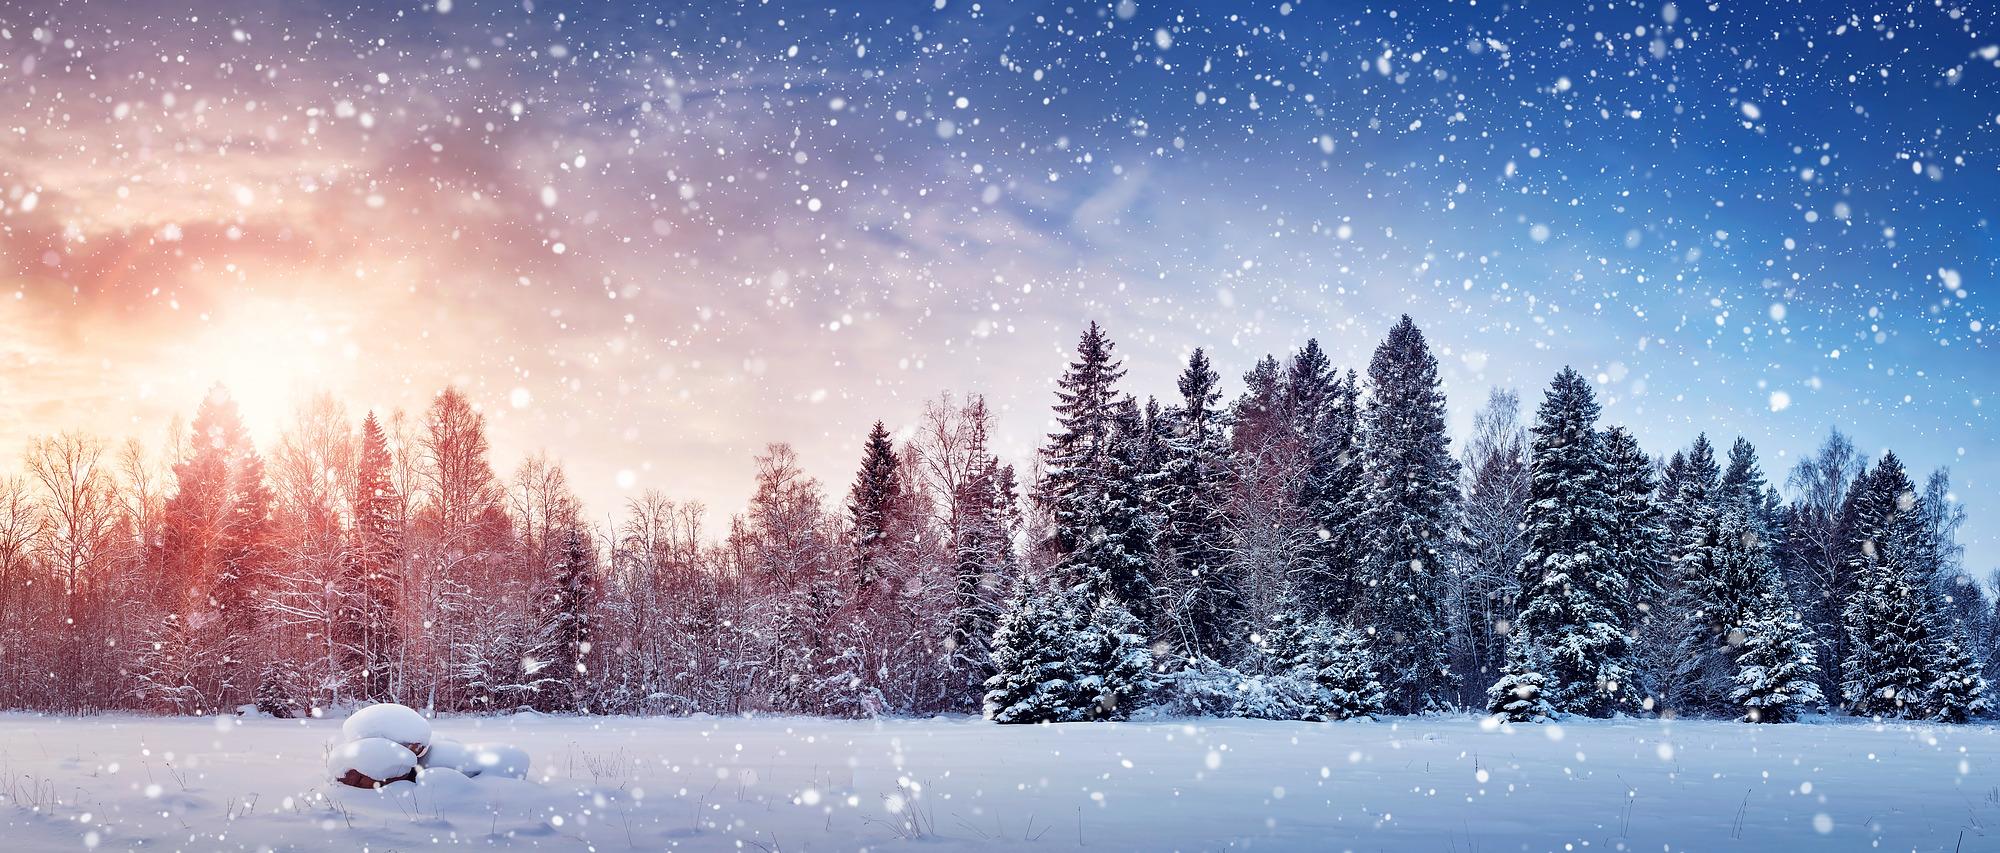 Preventing Colds Amp Depression During The Winter Season Autumn Asphodel